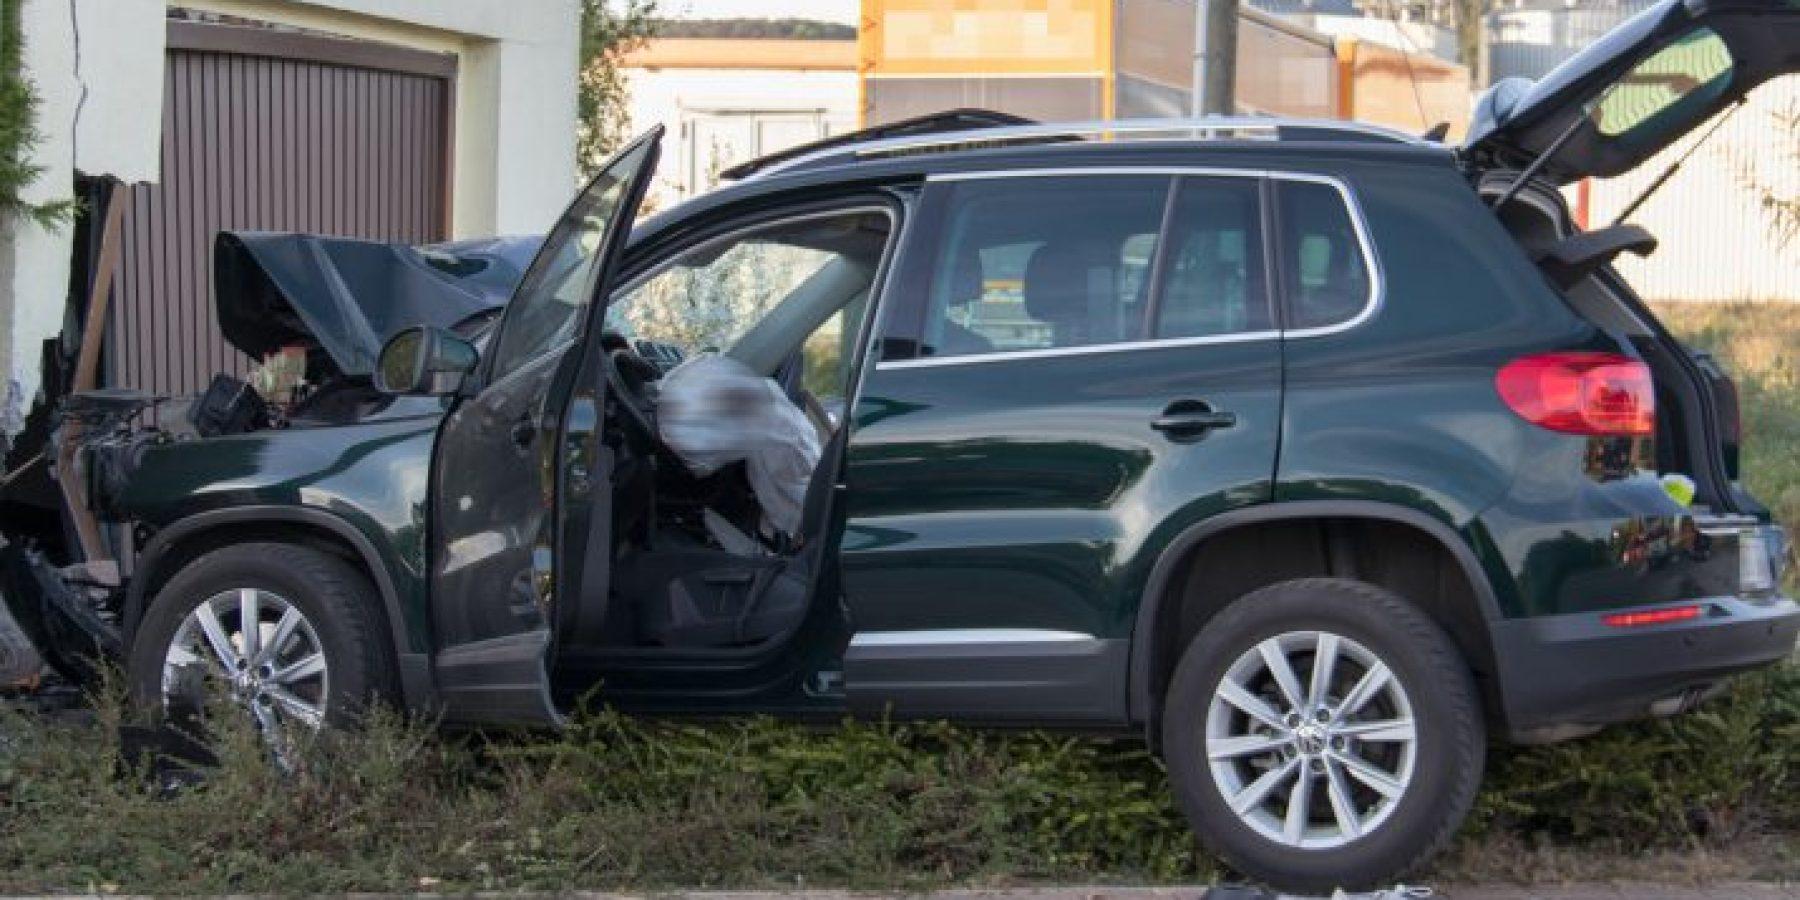 Tödlicher Unglücksfall am Rilkeweg